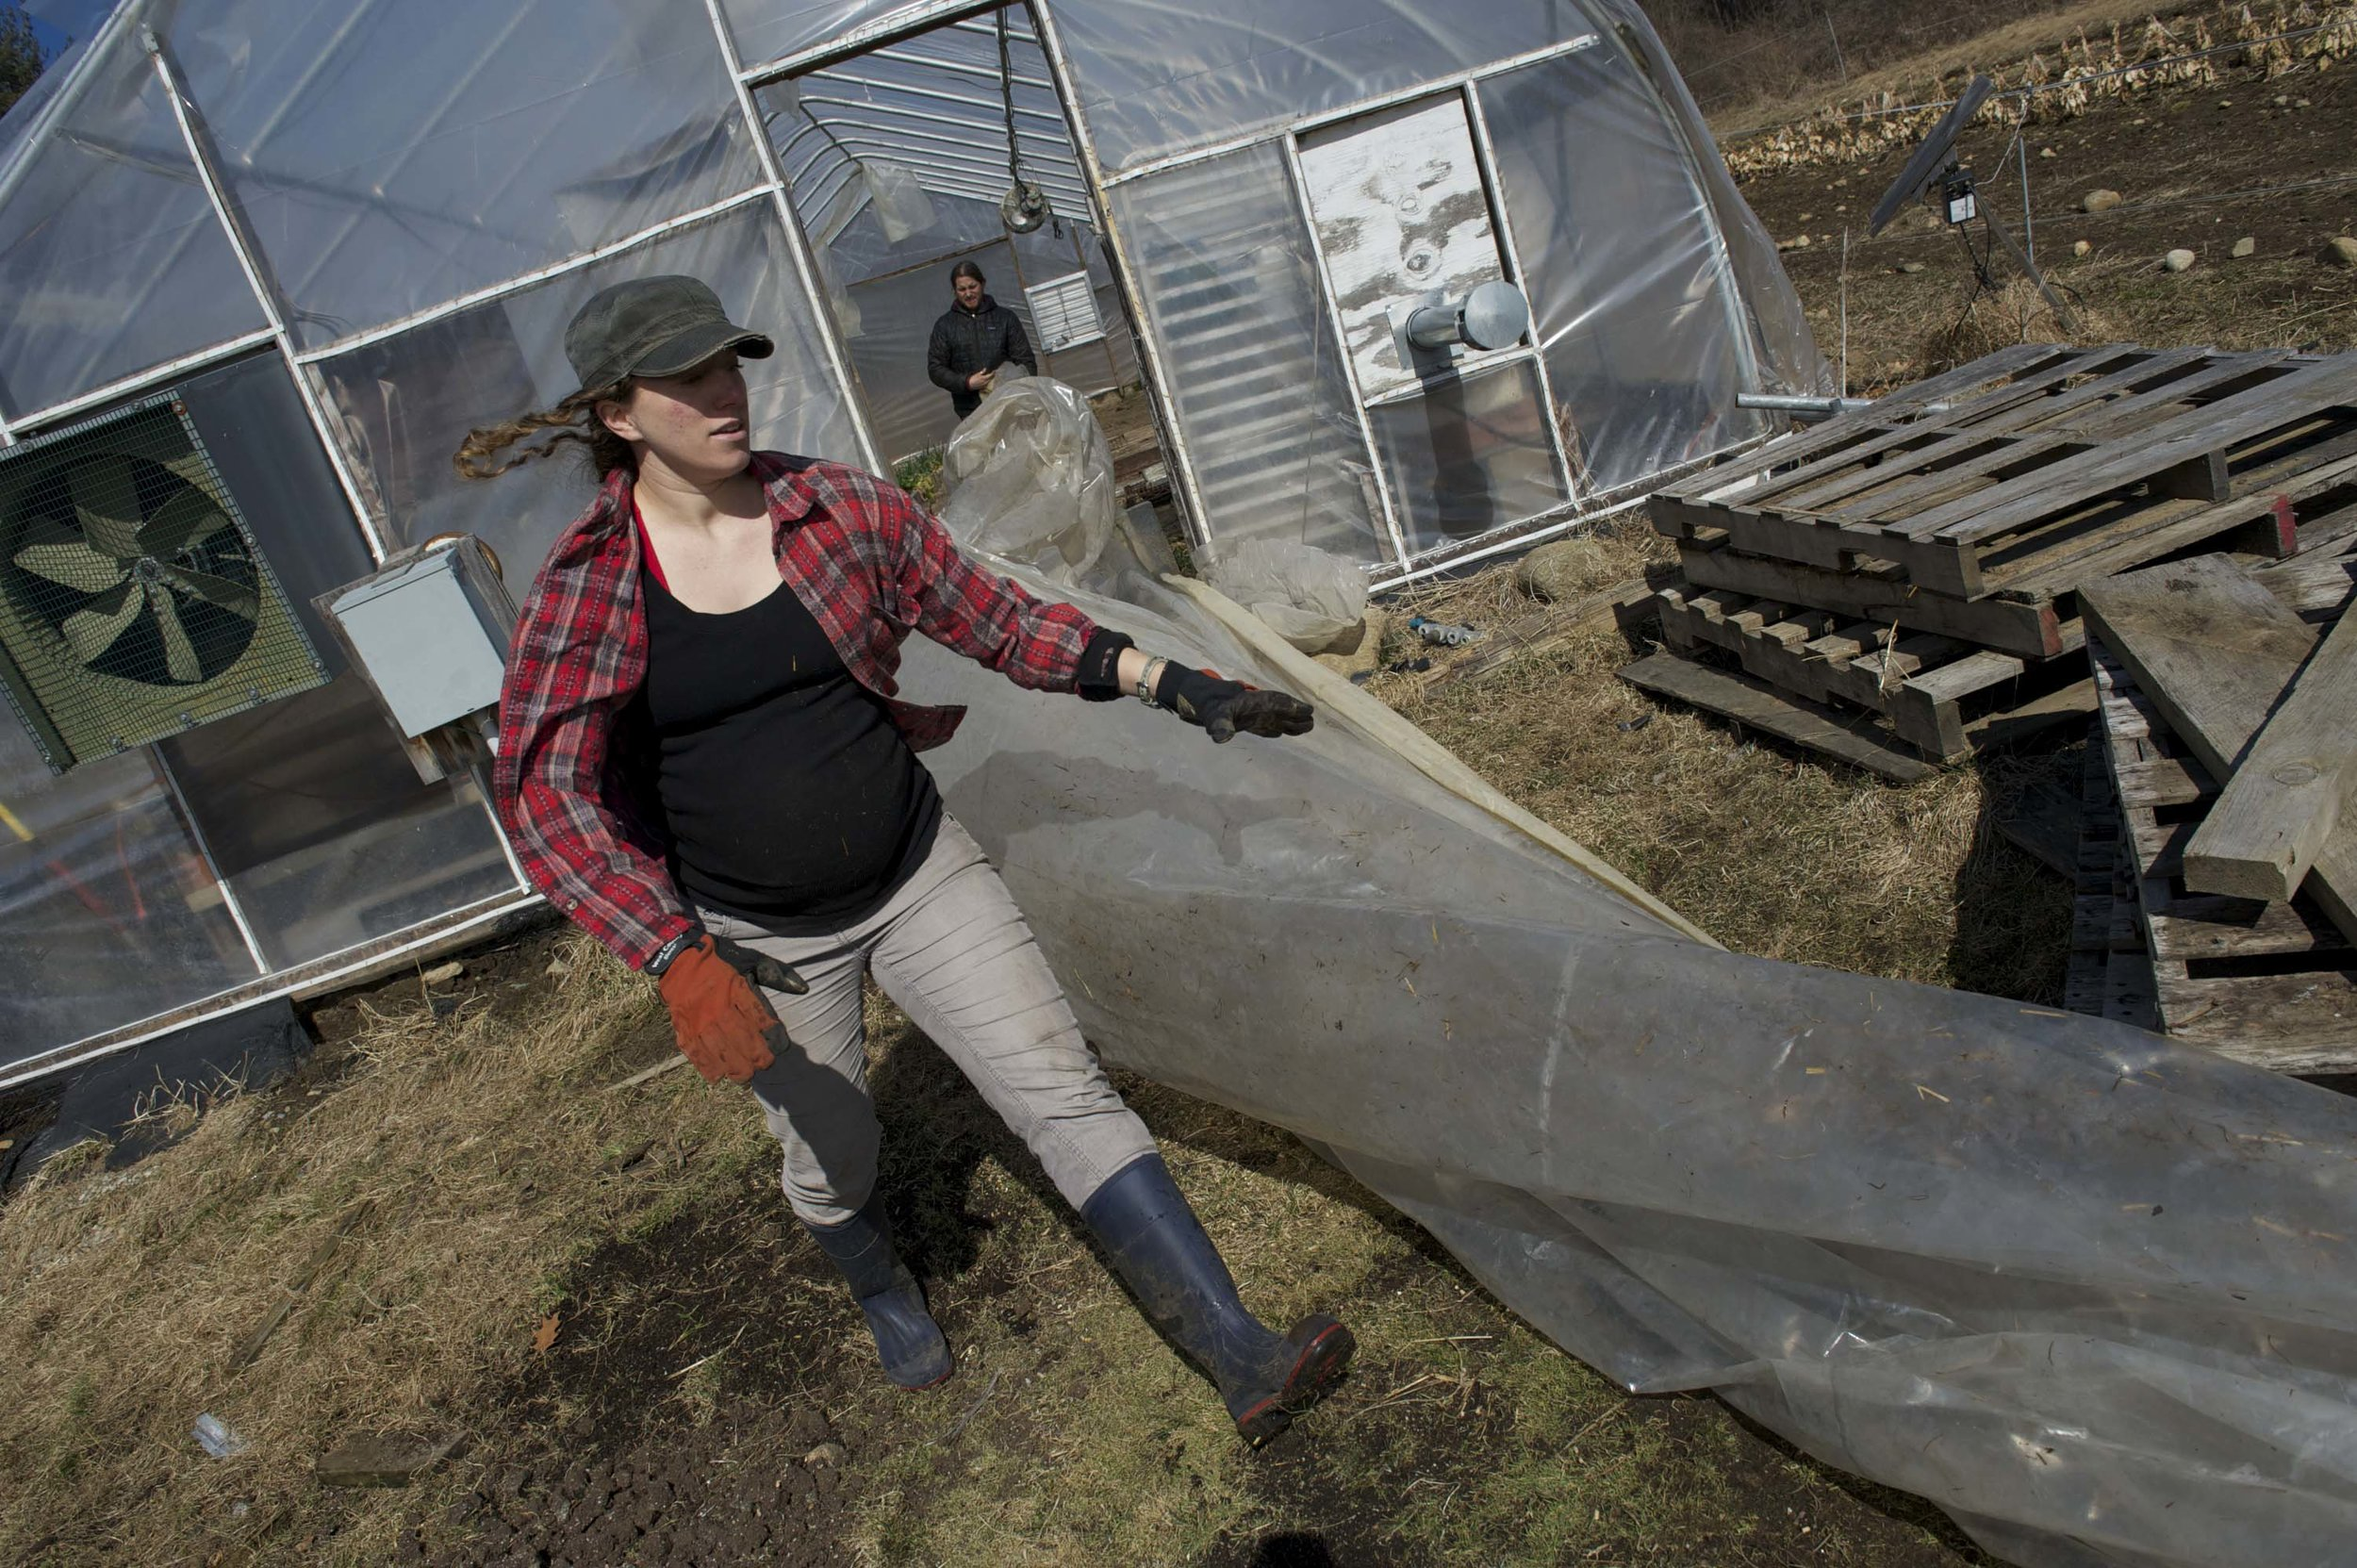 Kimberly, farmer - Josh Marianelli, 2012, © Josh Marianelli